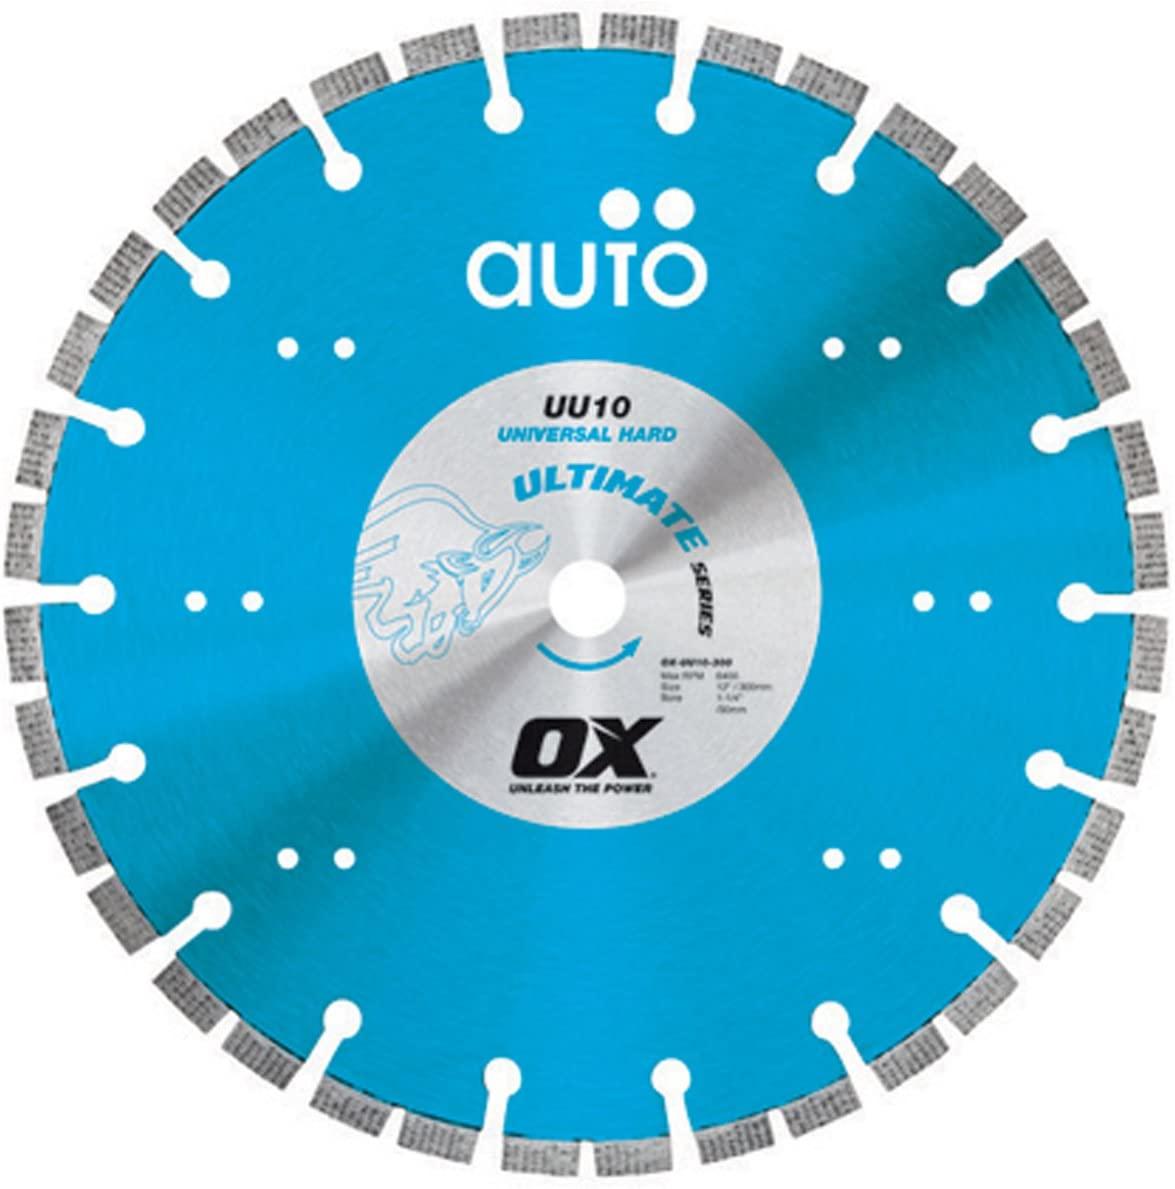 OX Tools OX-UU10-16 Ultimate Universal/Hard 16